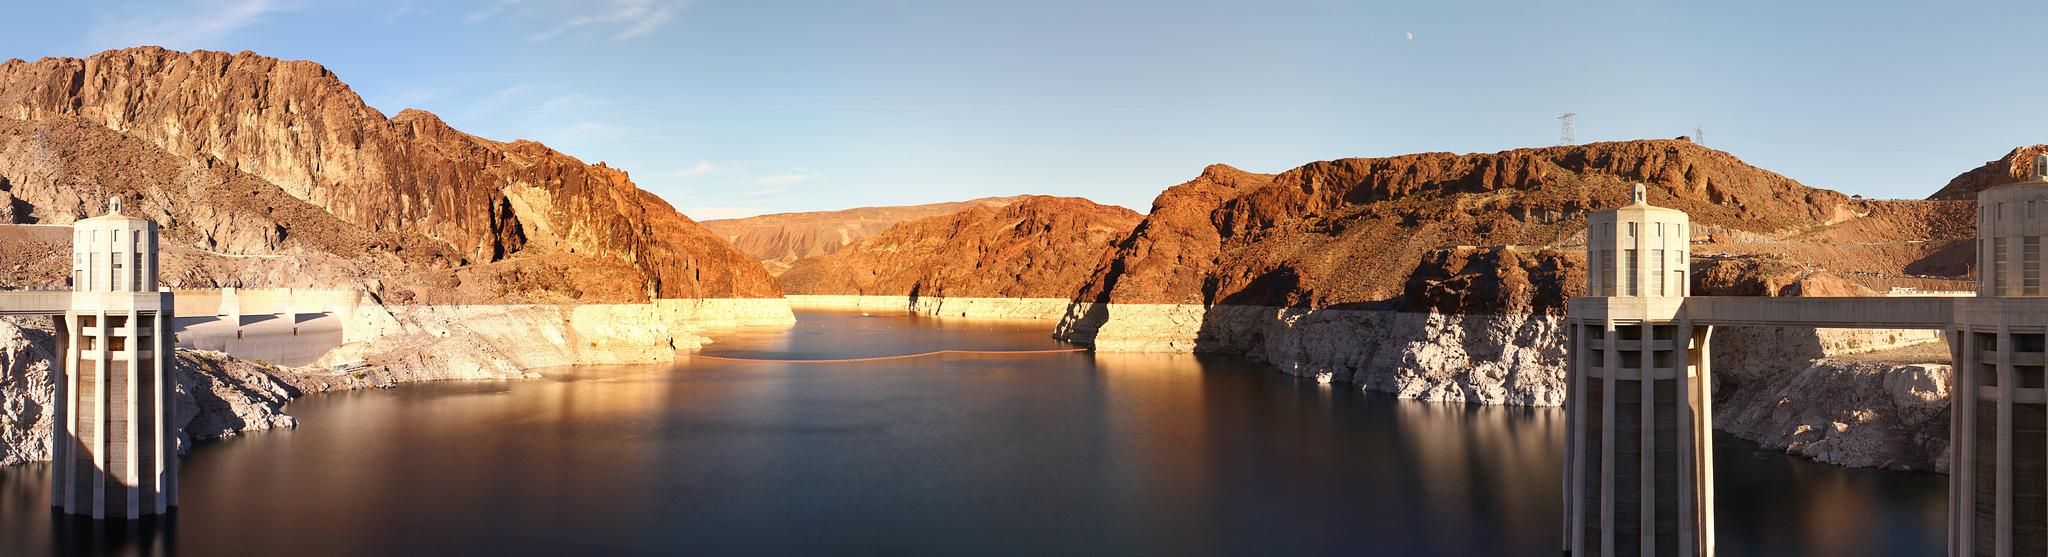 Lake_Mead_Panorama_2